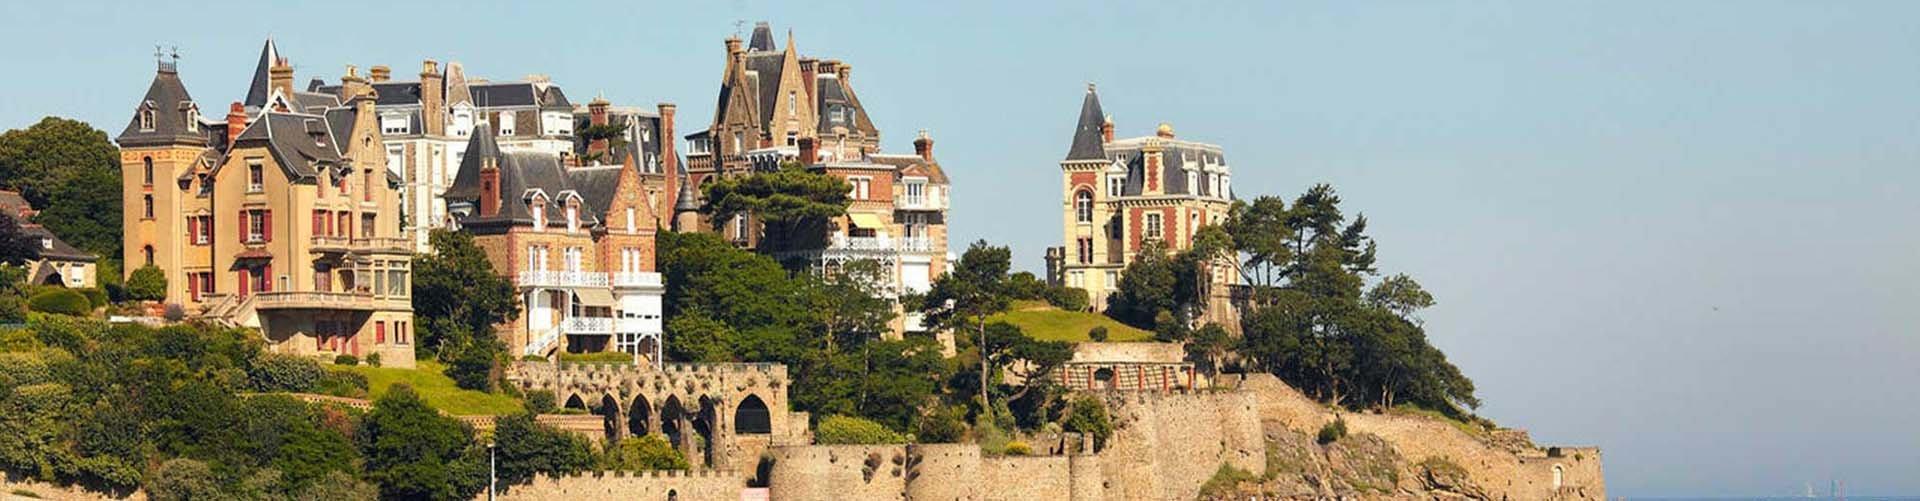 Banner Hotel Balmoral, Bretagne - Dinard